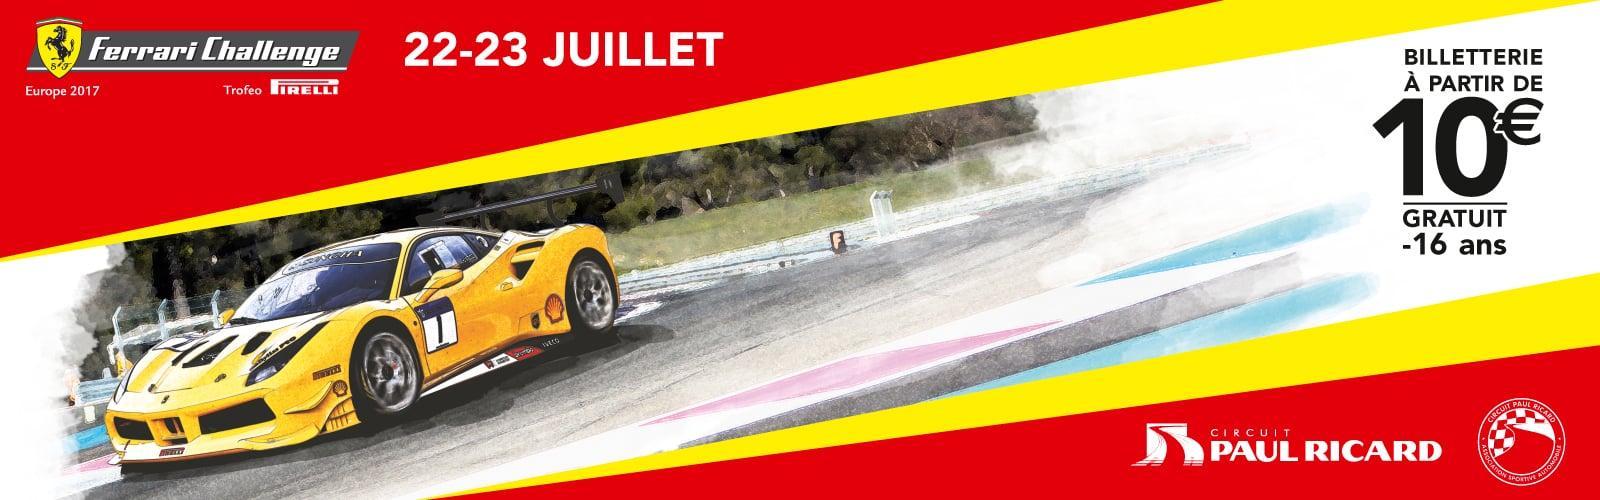 Ferrari Challenge Circuit Paul Ricard 2017